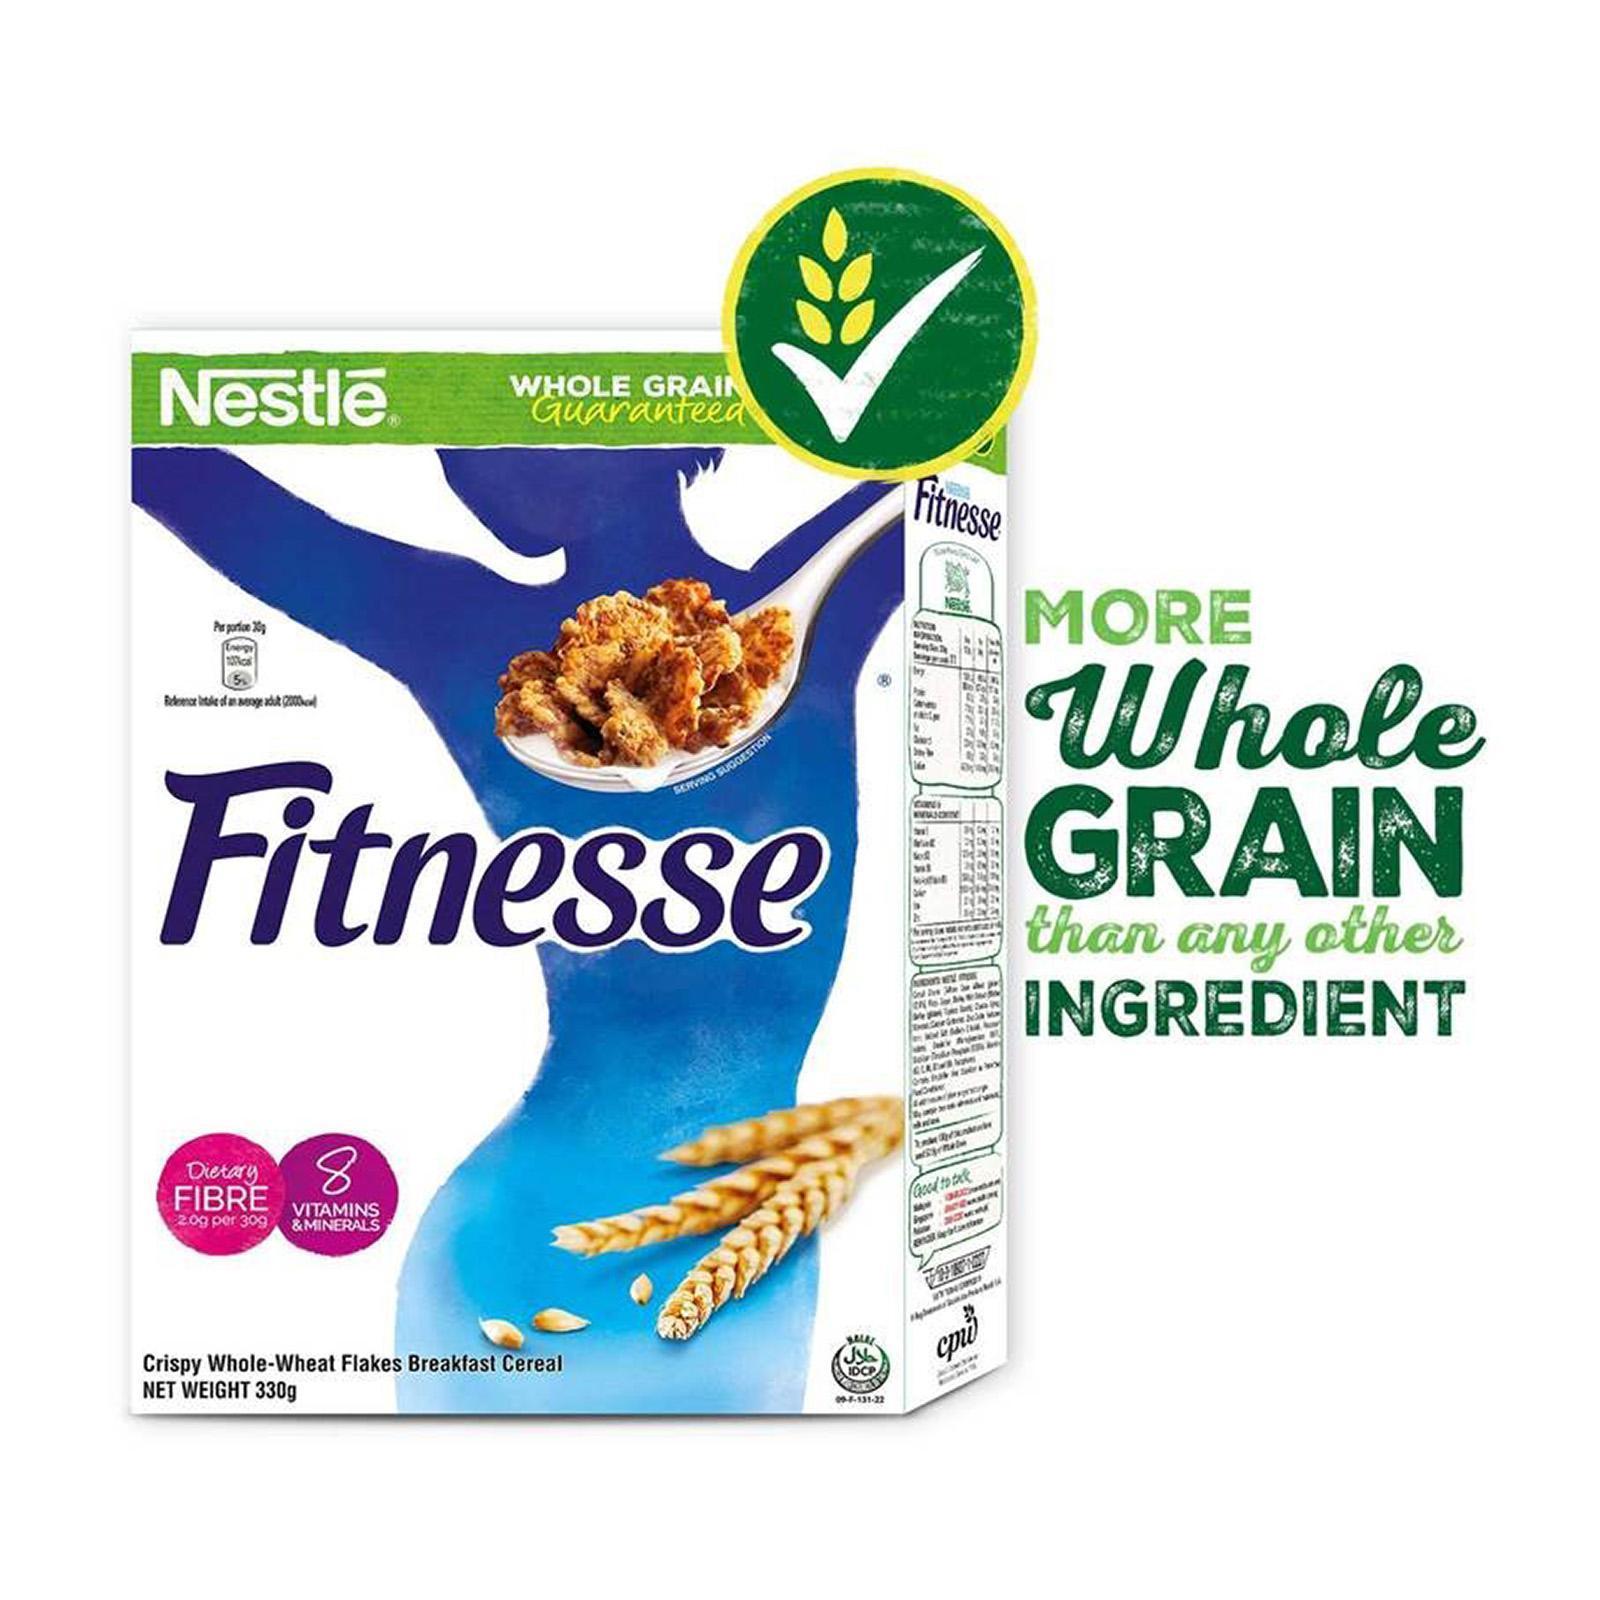 NESTLE FITNESSE Original Breakfast Cereal (330G)